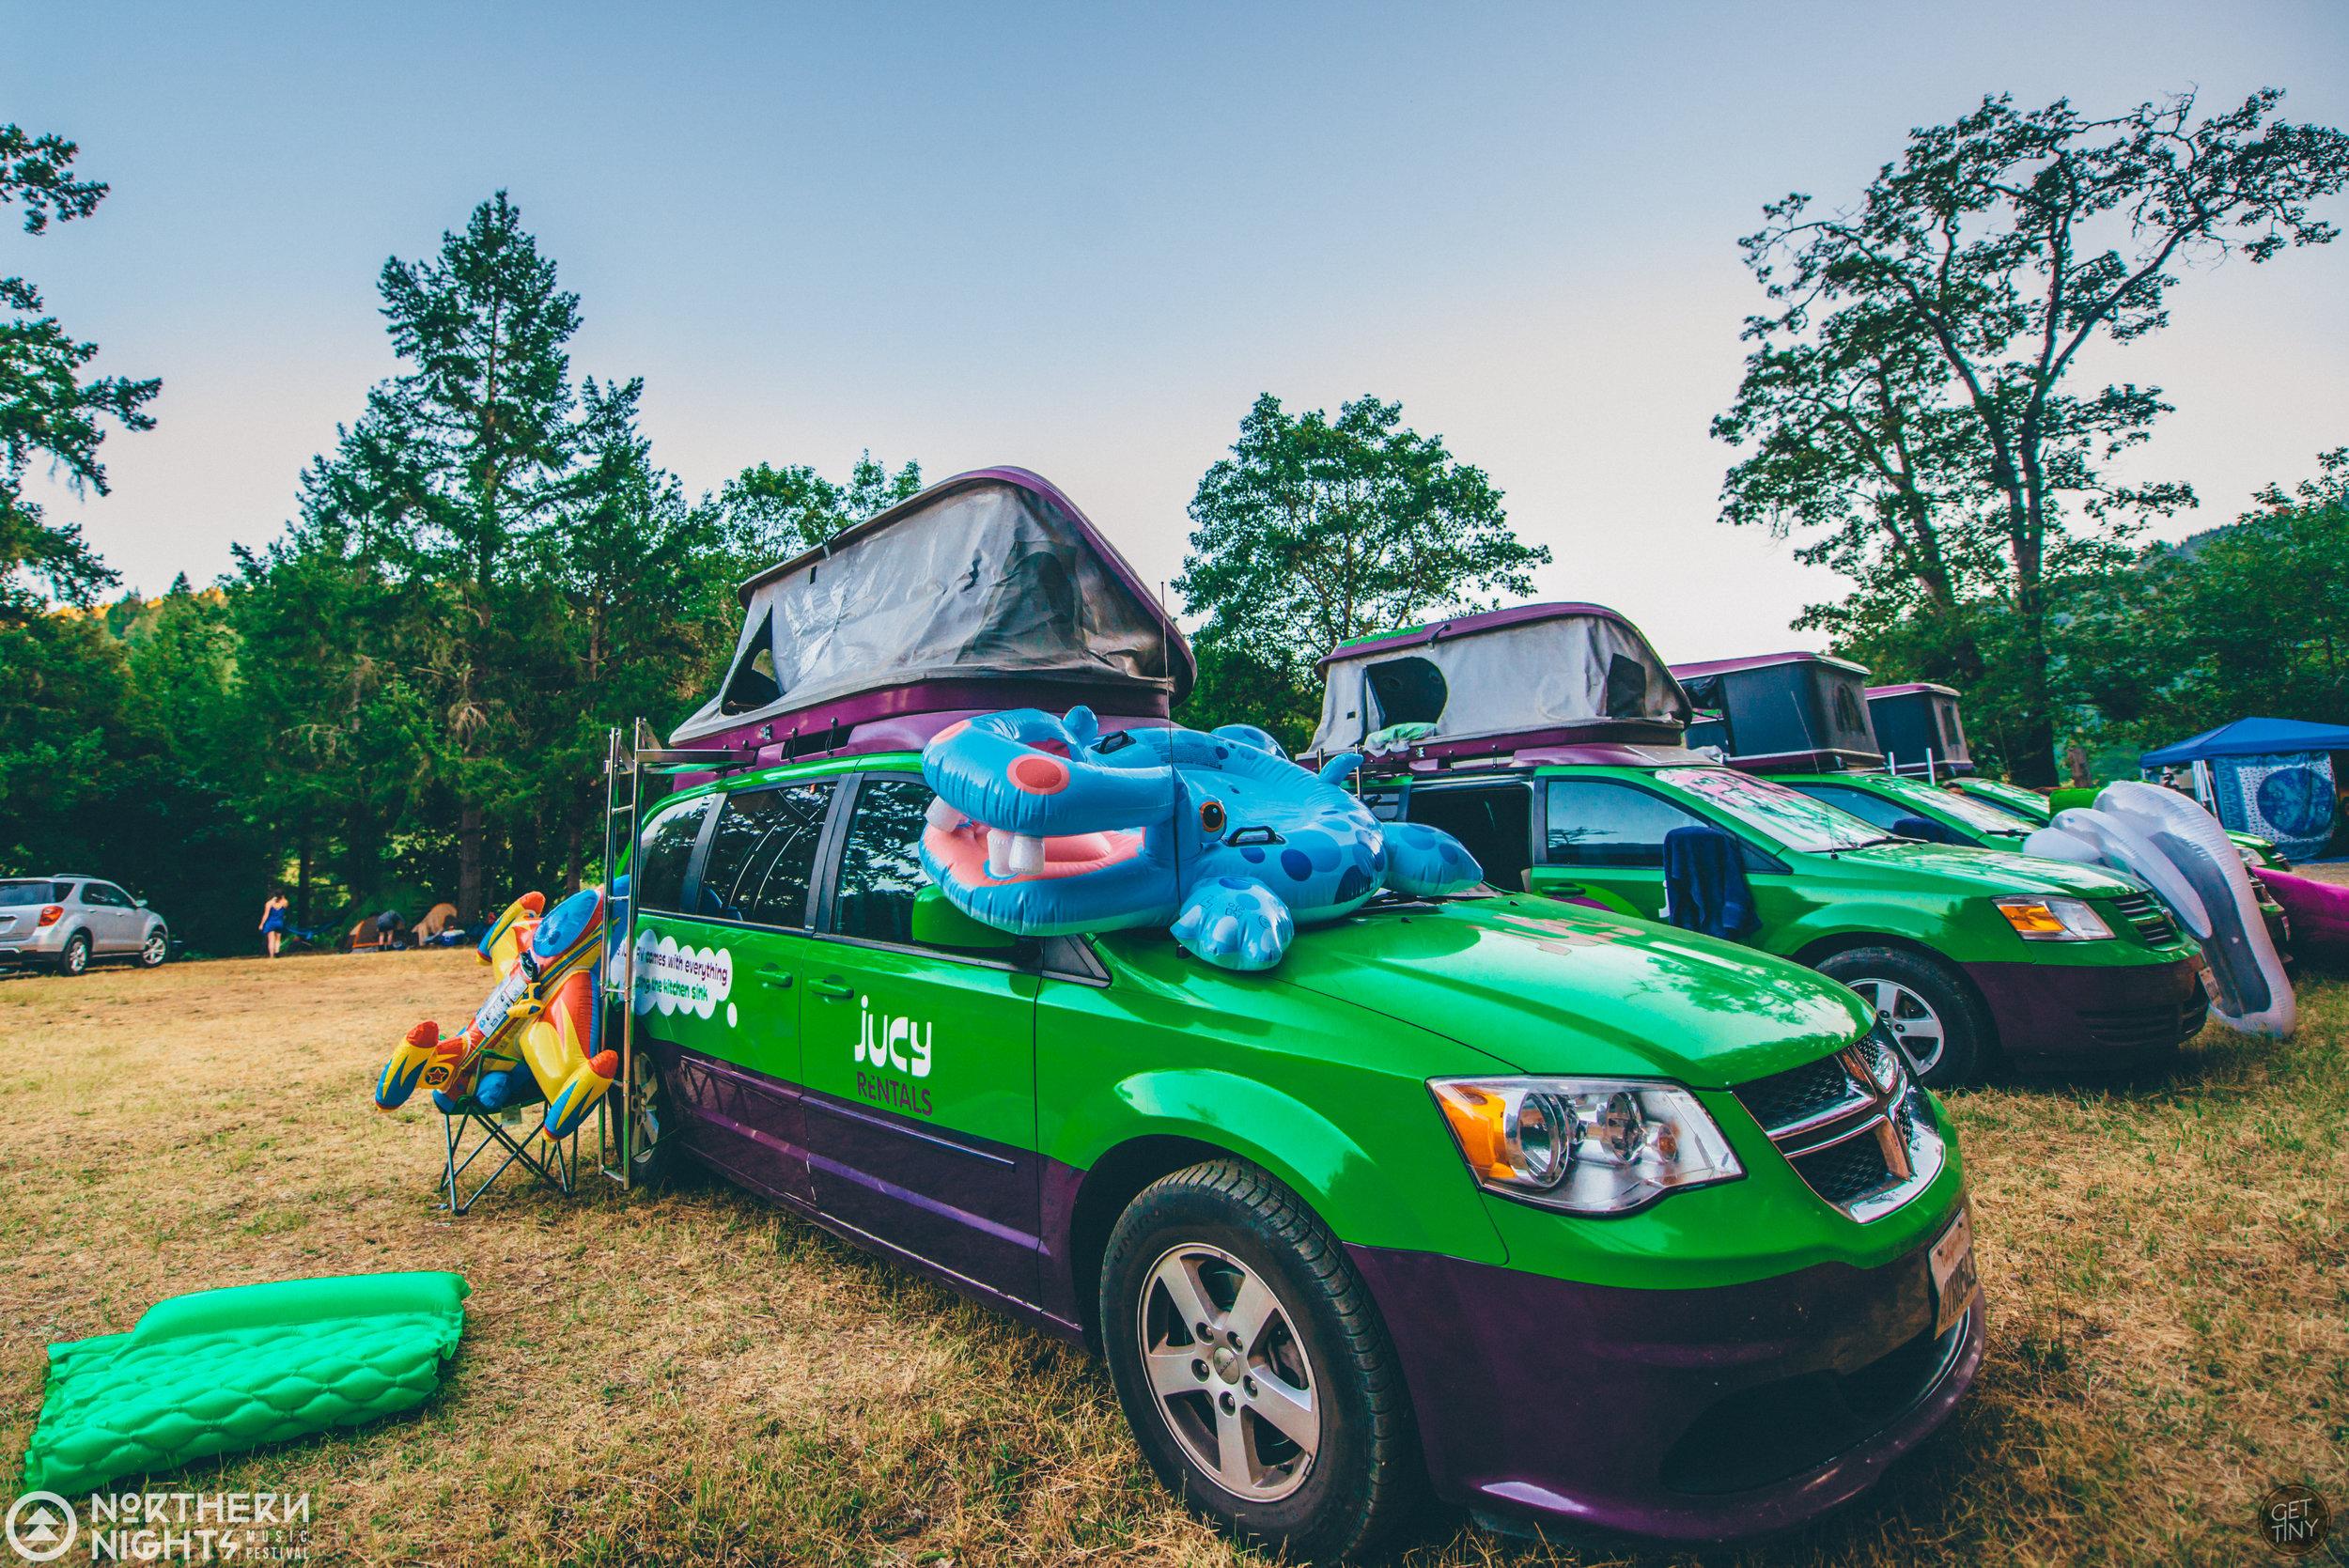 jucy-camping-festival.jpg